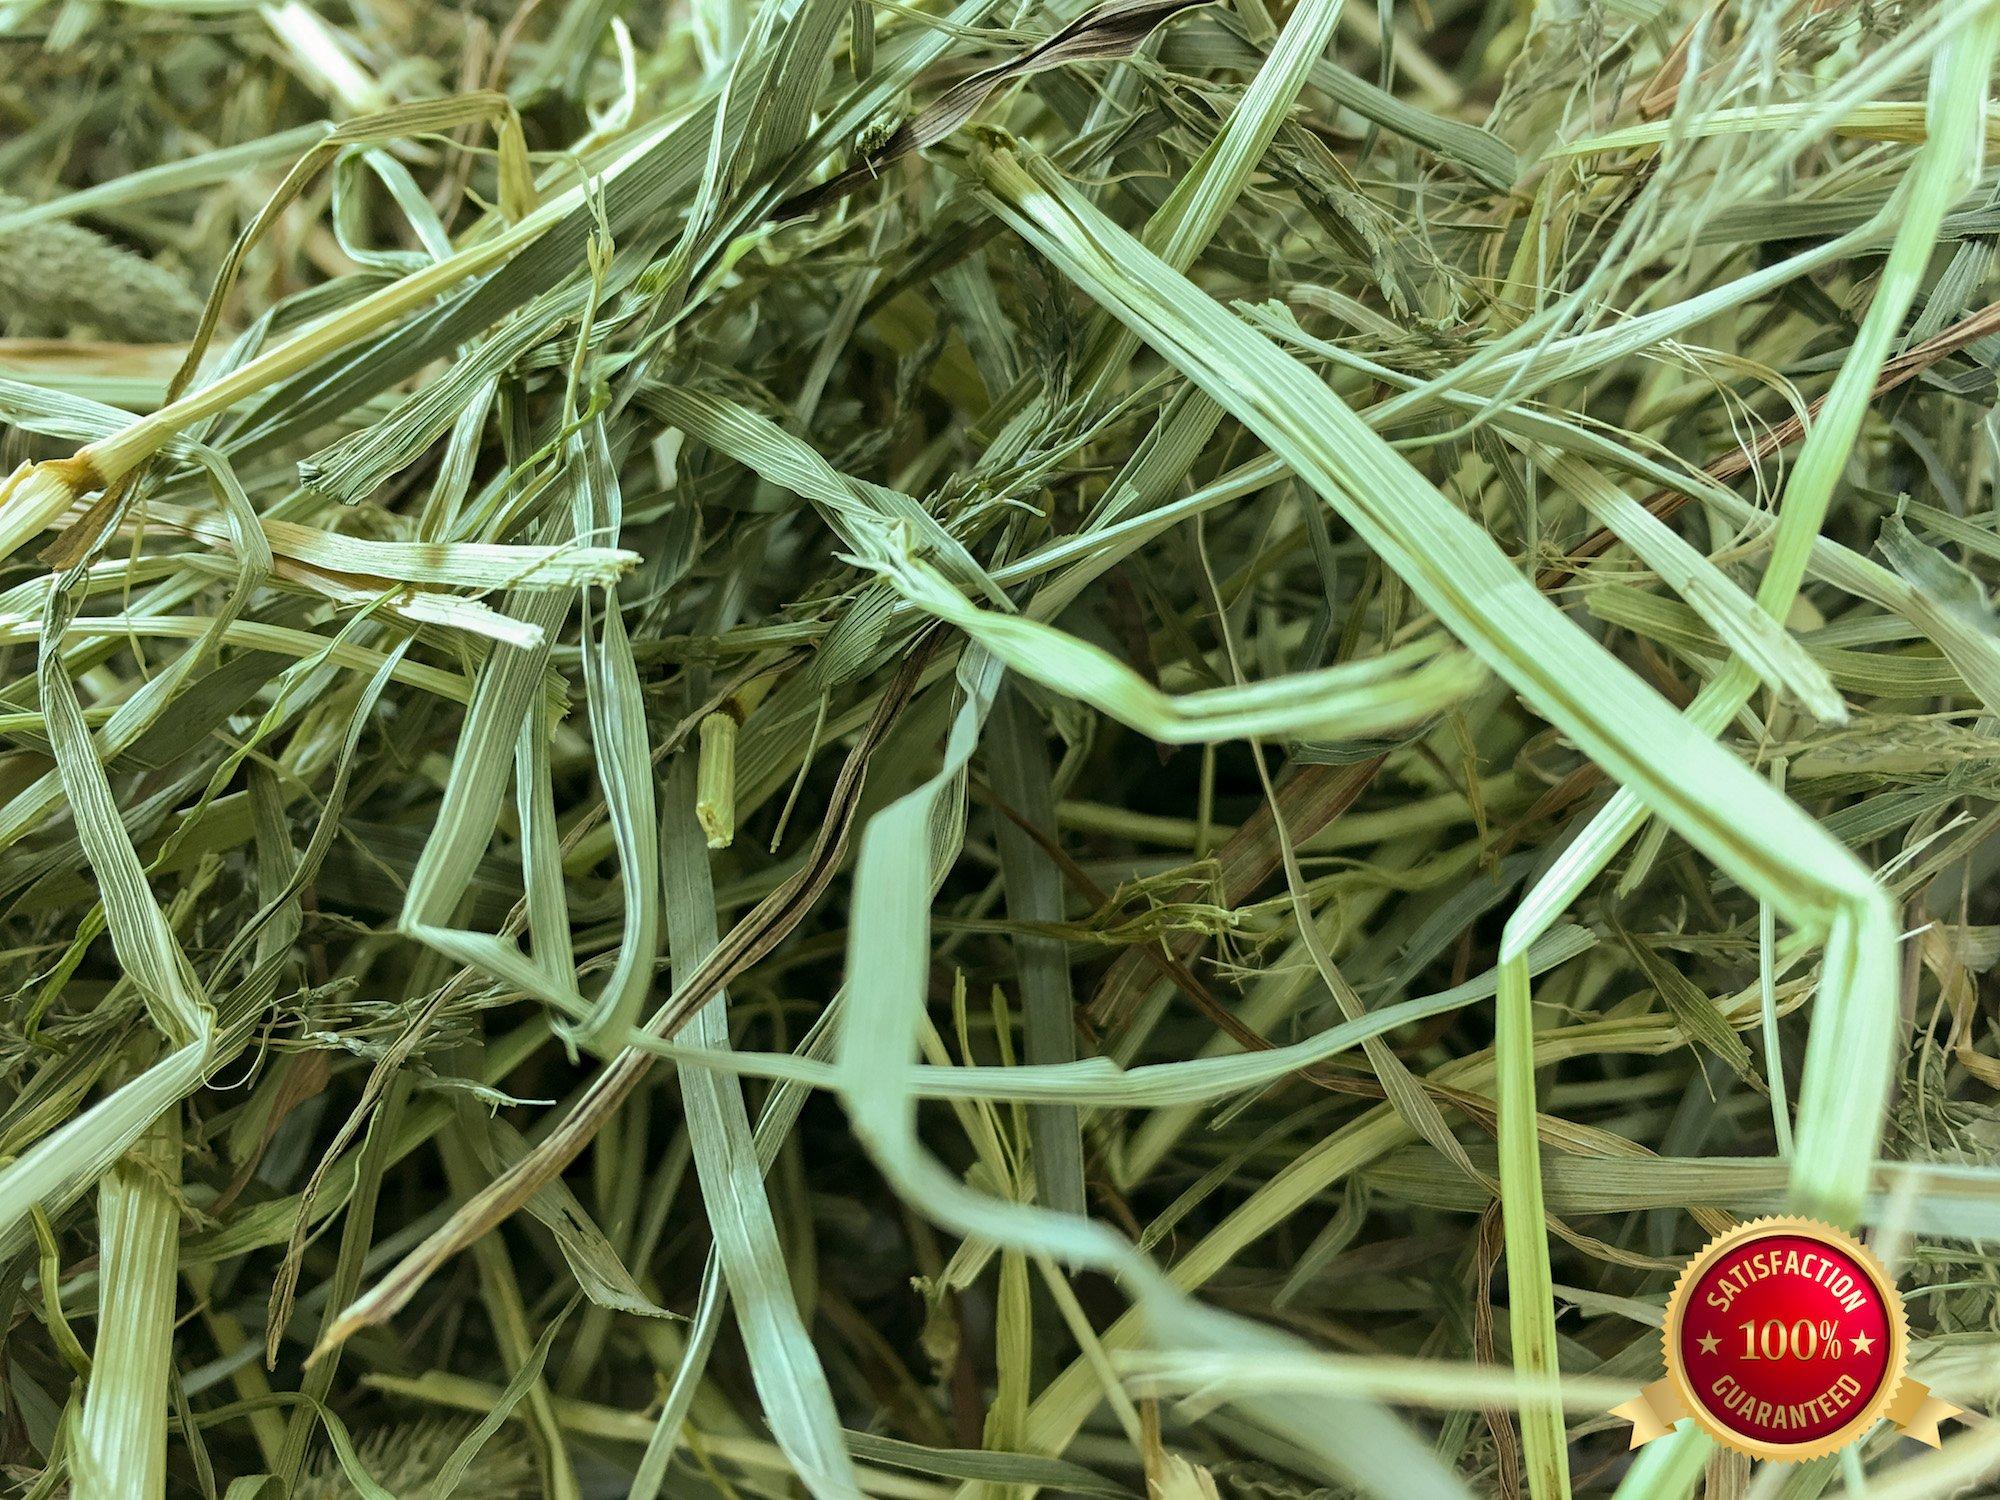 Rabbit Hole Hay Third Cut Timothy Hay (1 lbs.)